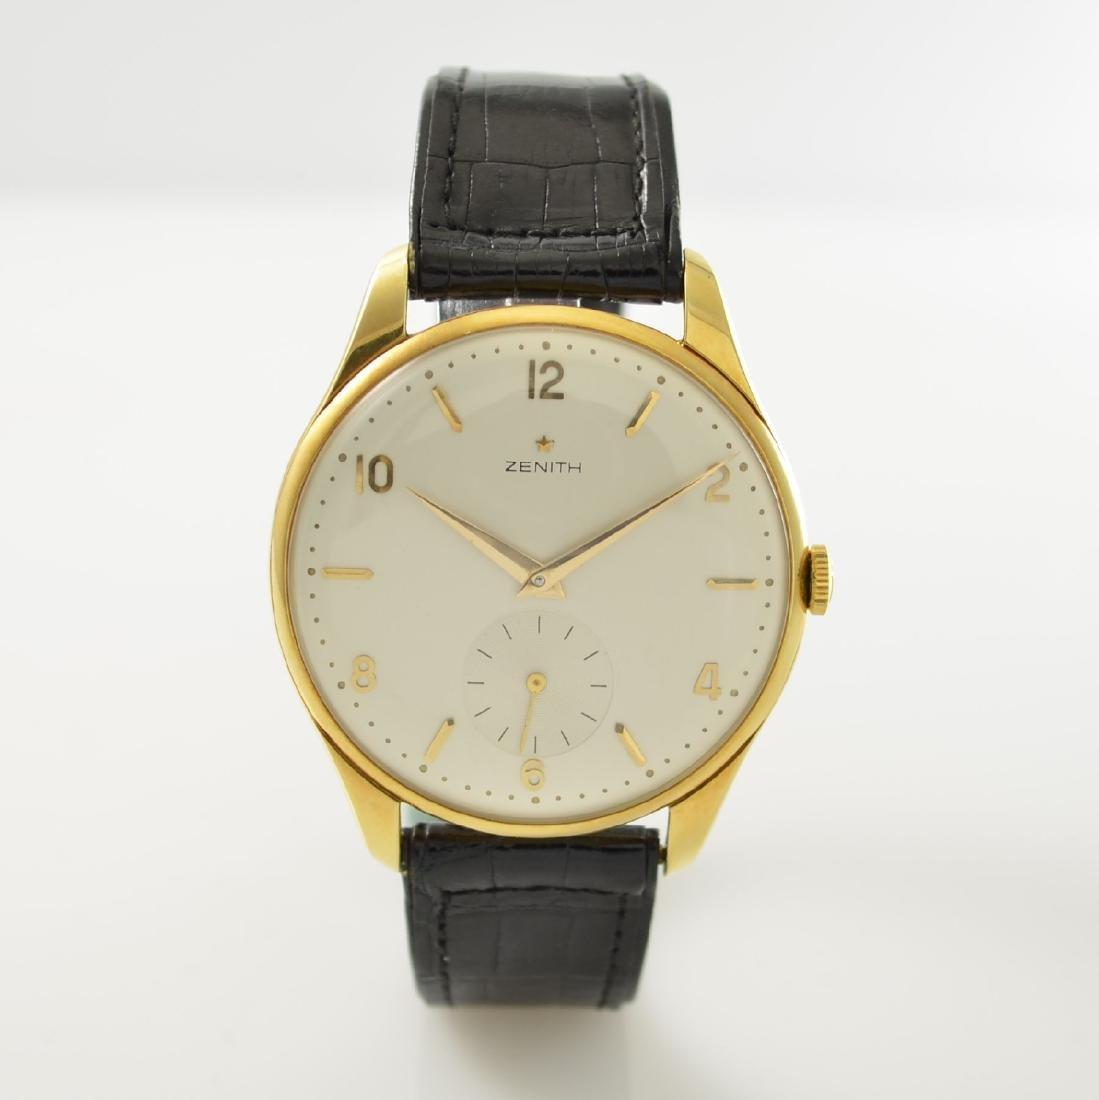 ZENITH oversized 18k yellow gold gents wristwatch - 3